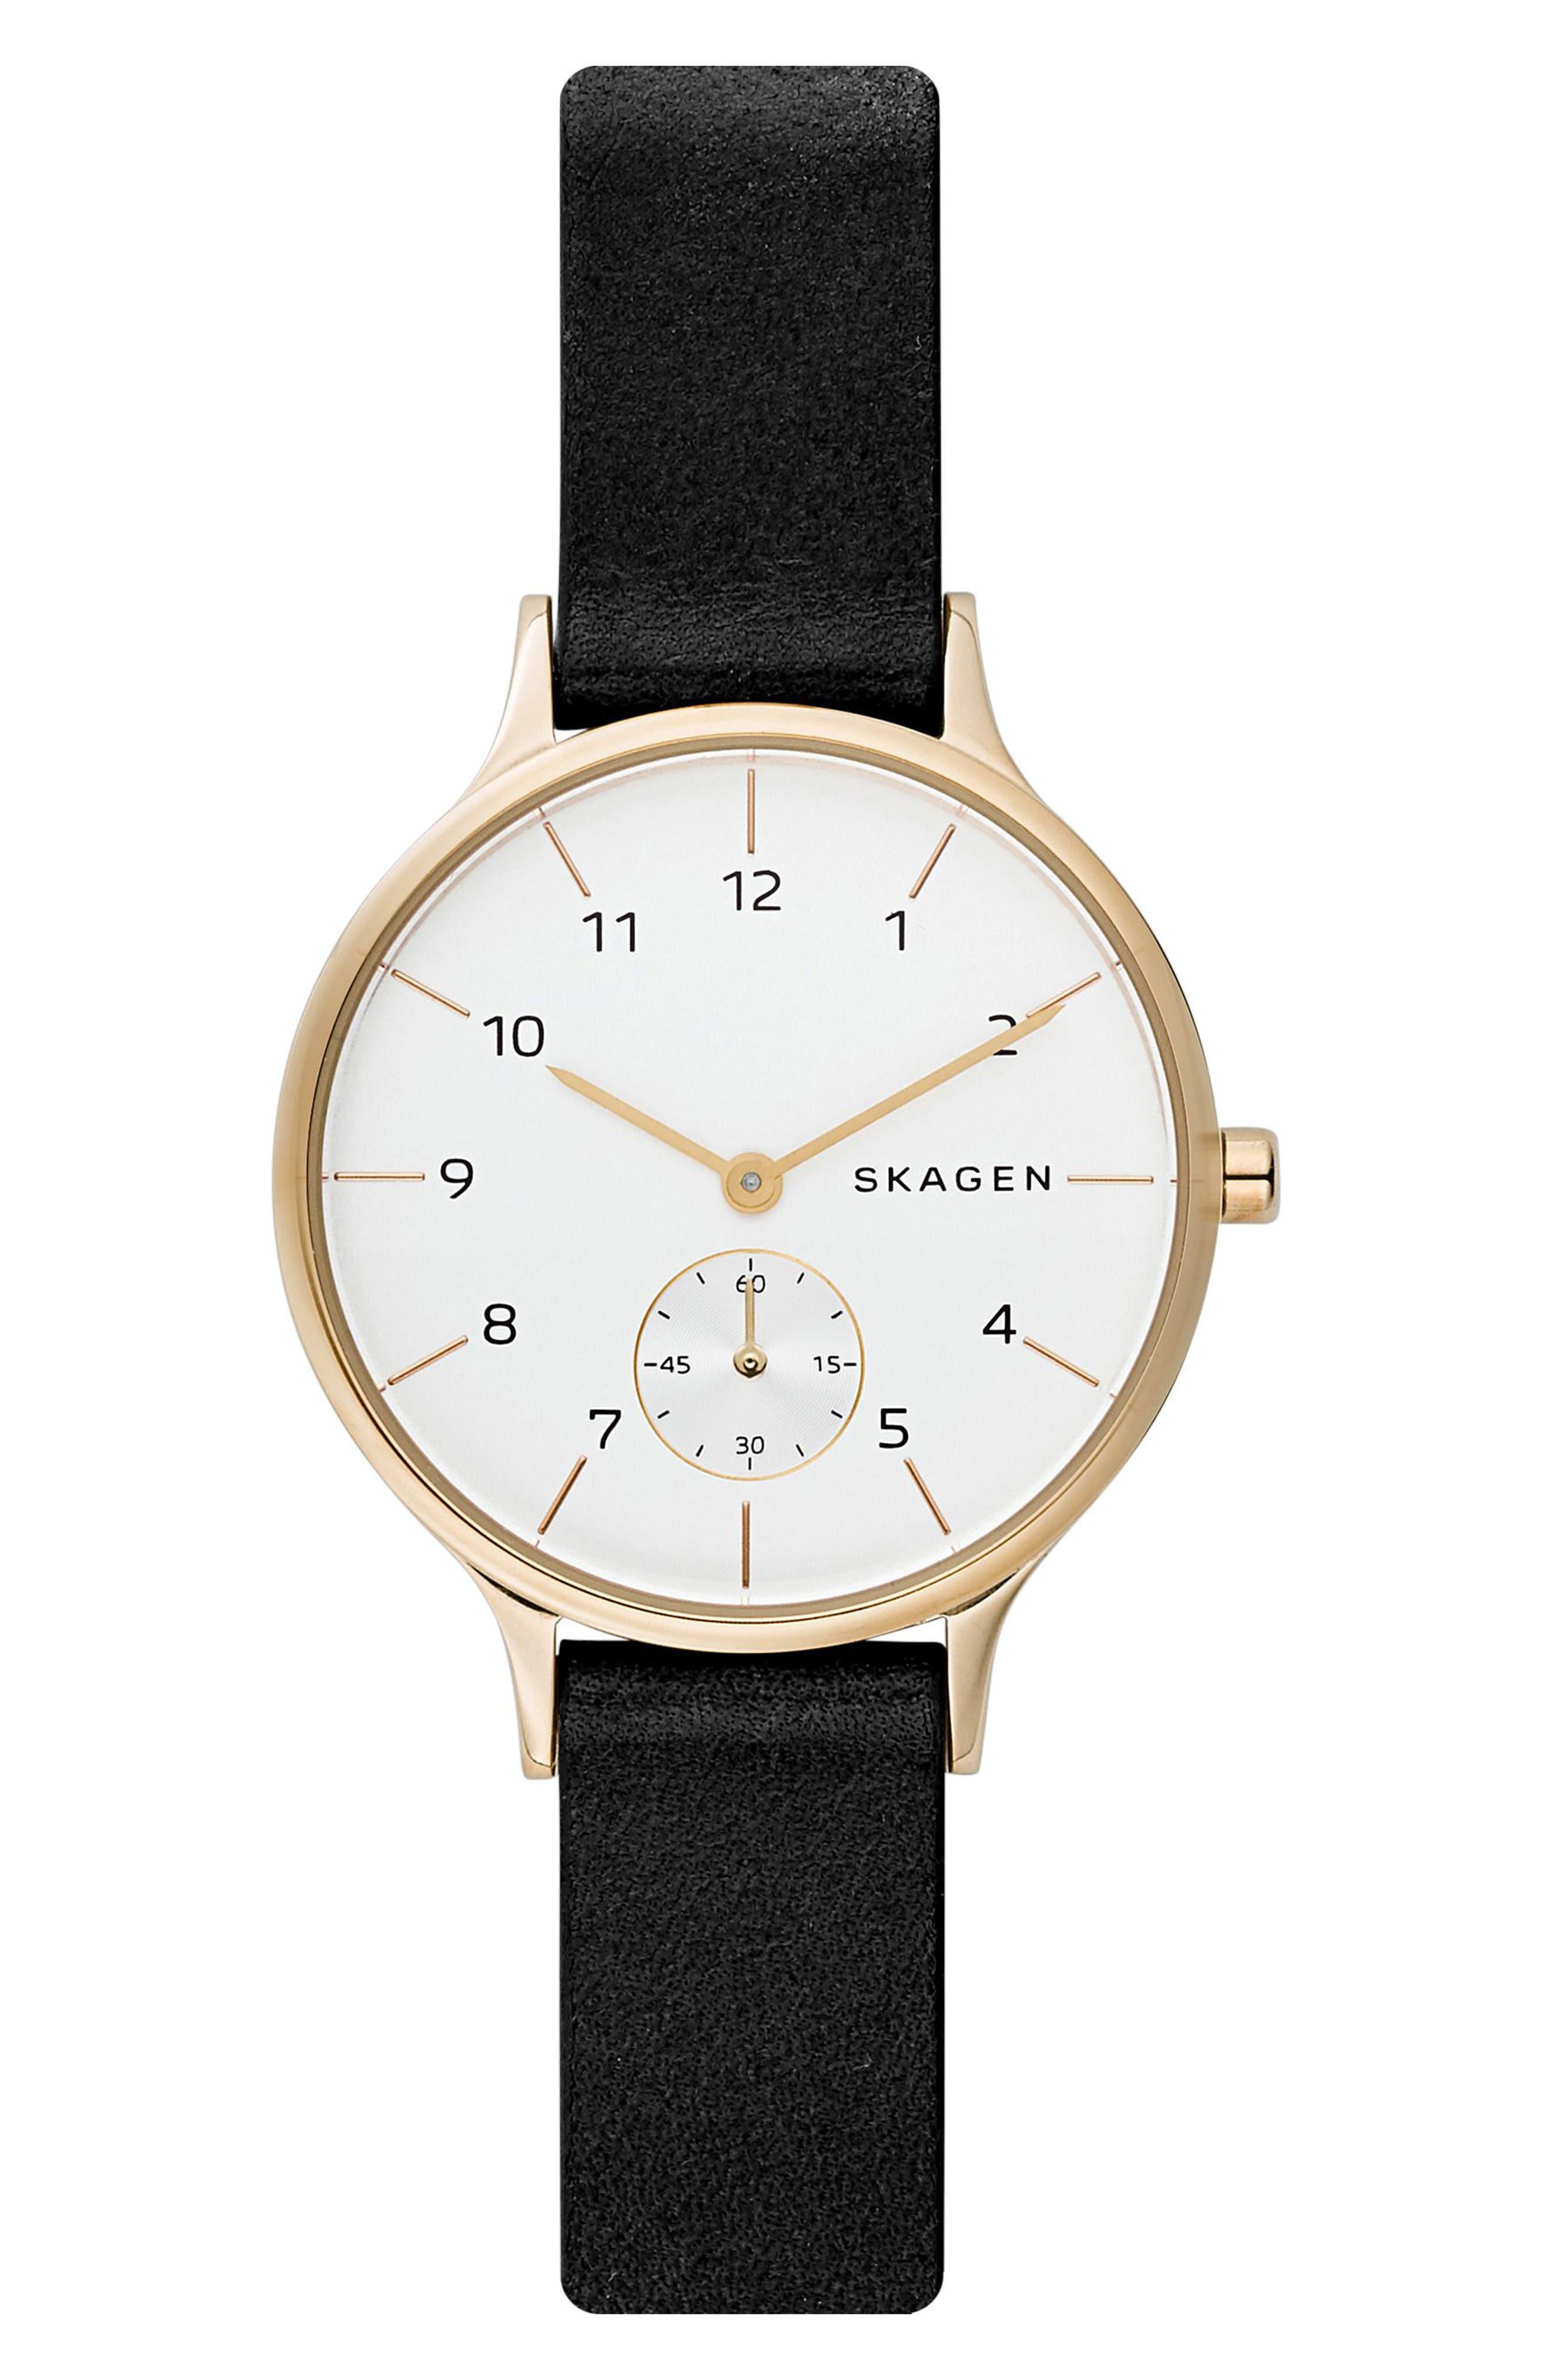 SKAGEN Anita Leather Strap Watch, 34mm, Main, color, 001